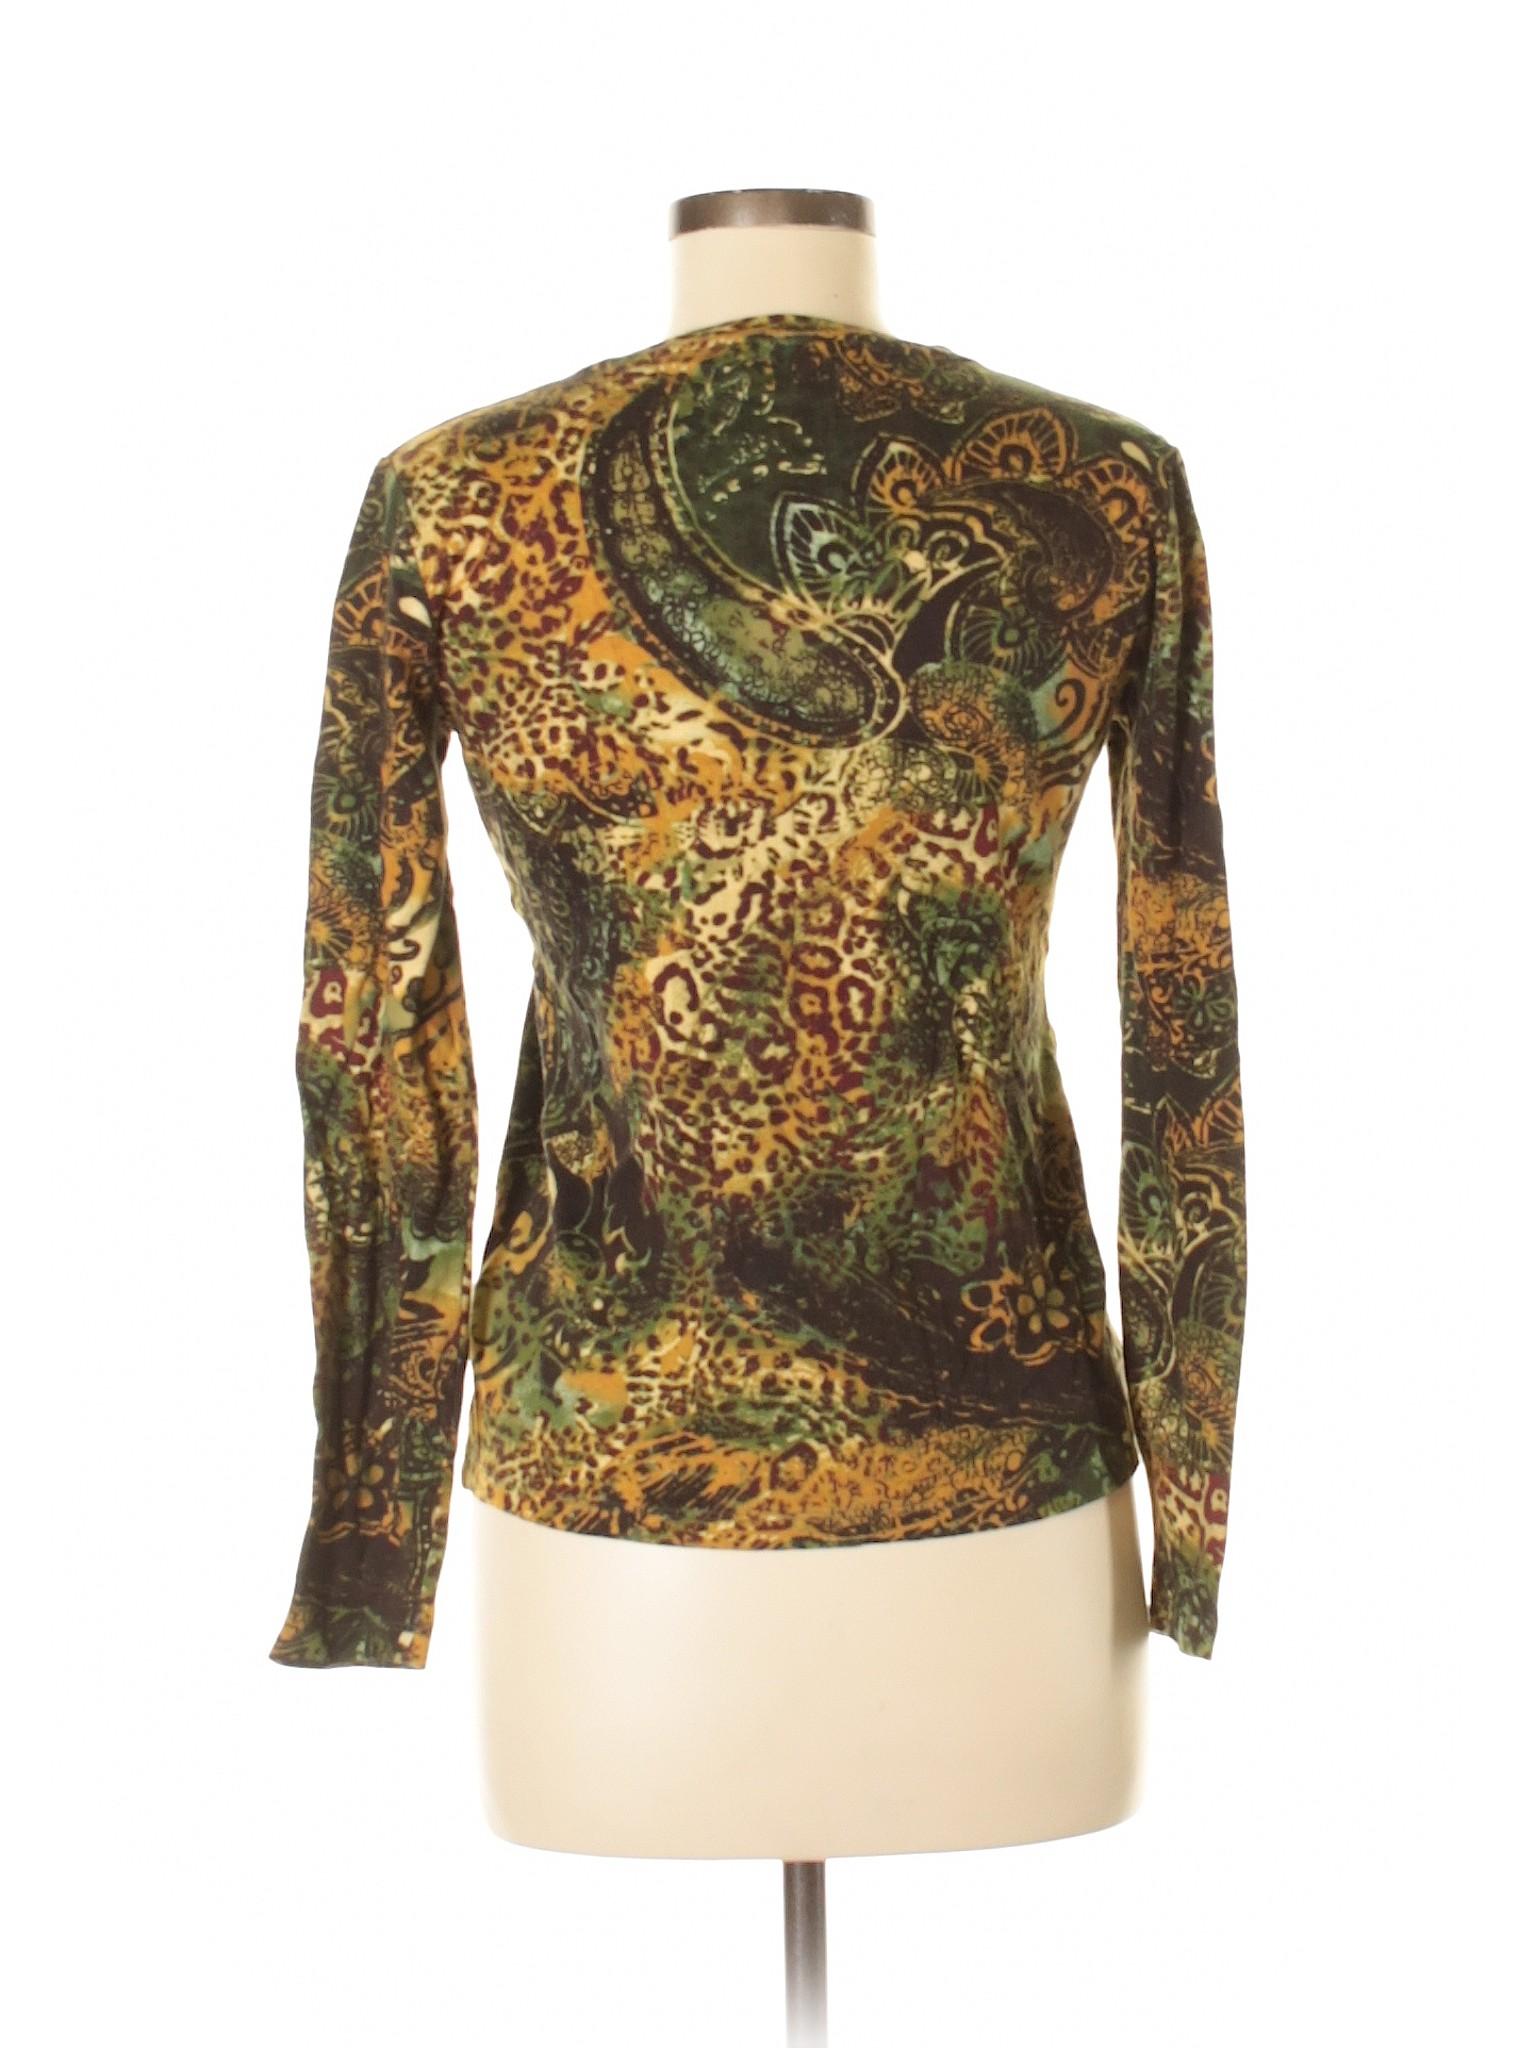 Boutique New Signature Jones Sweater York winter Pullover HHrFW8aB